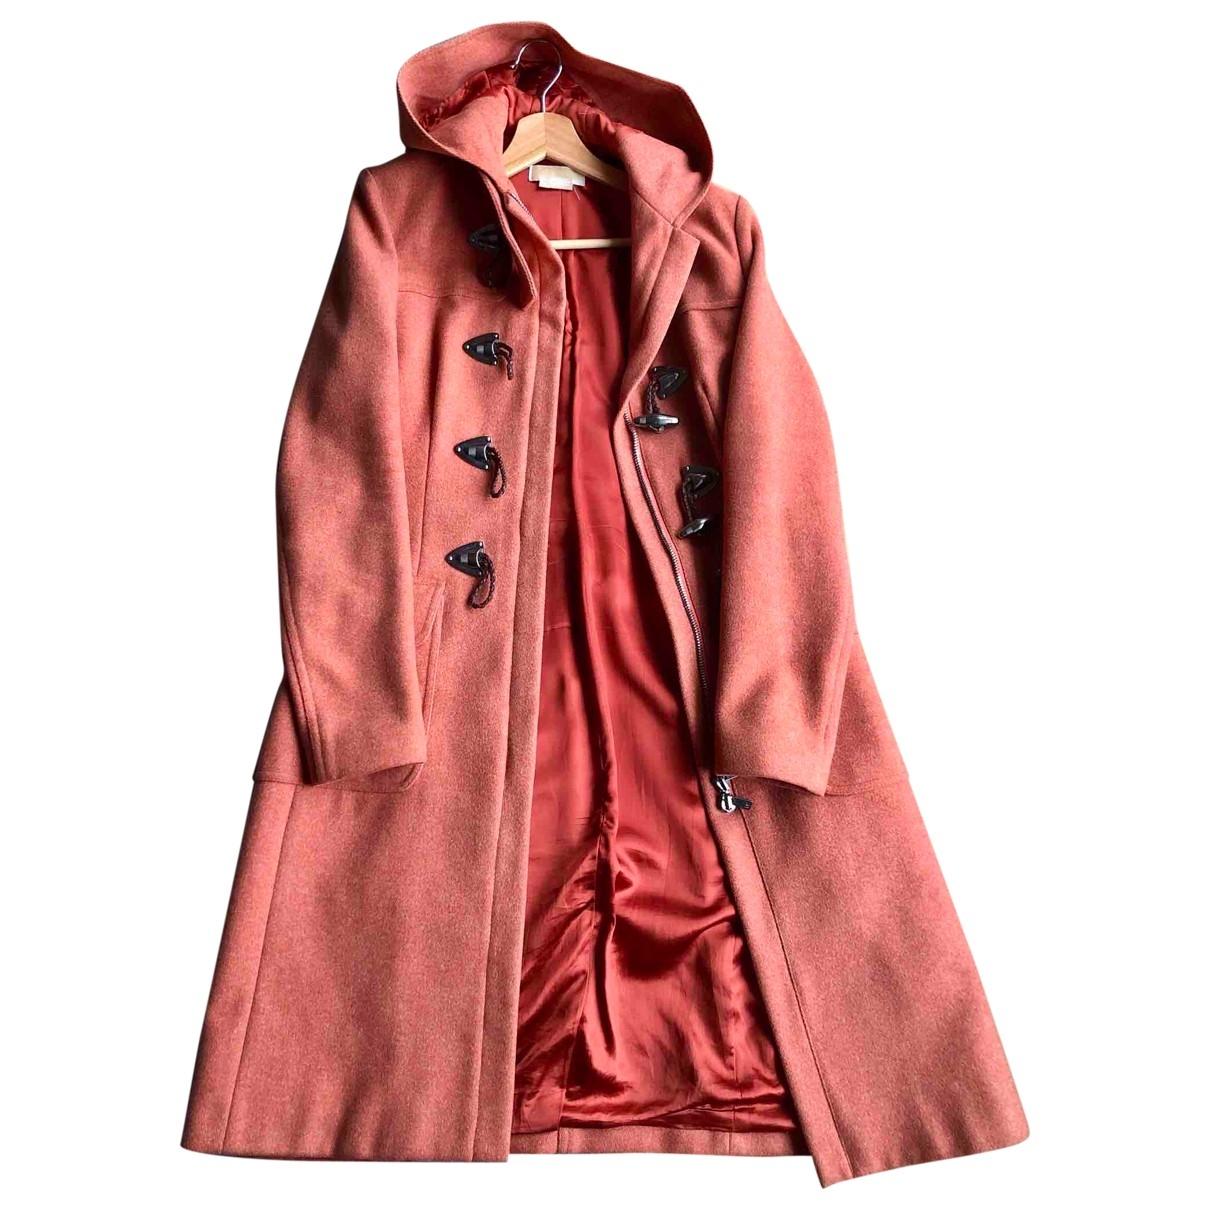 Michael Kors \N Wool coat for Women 4 US